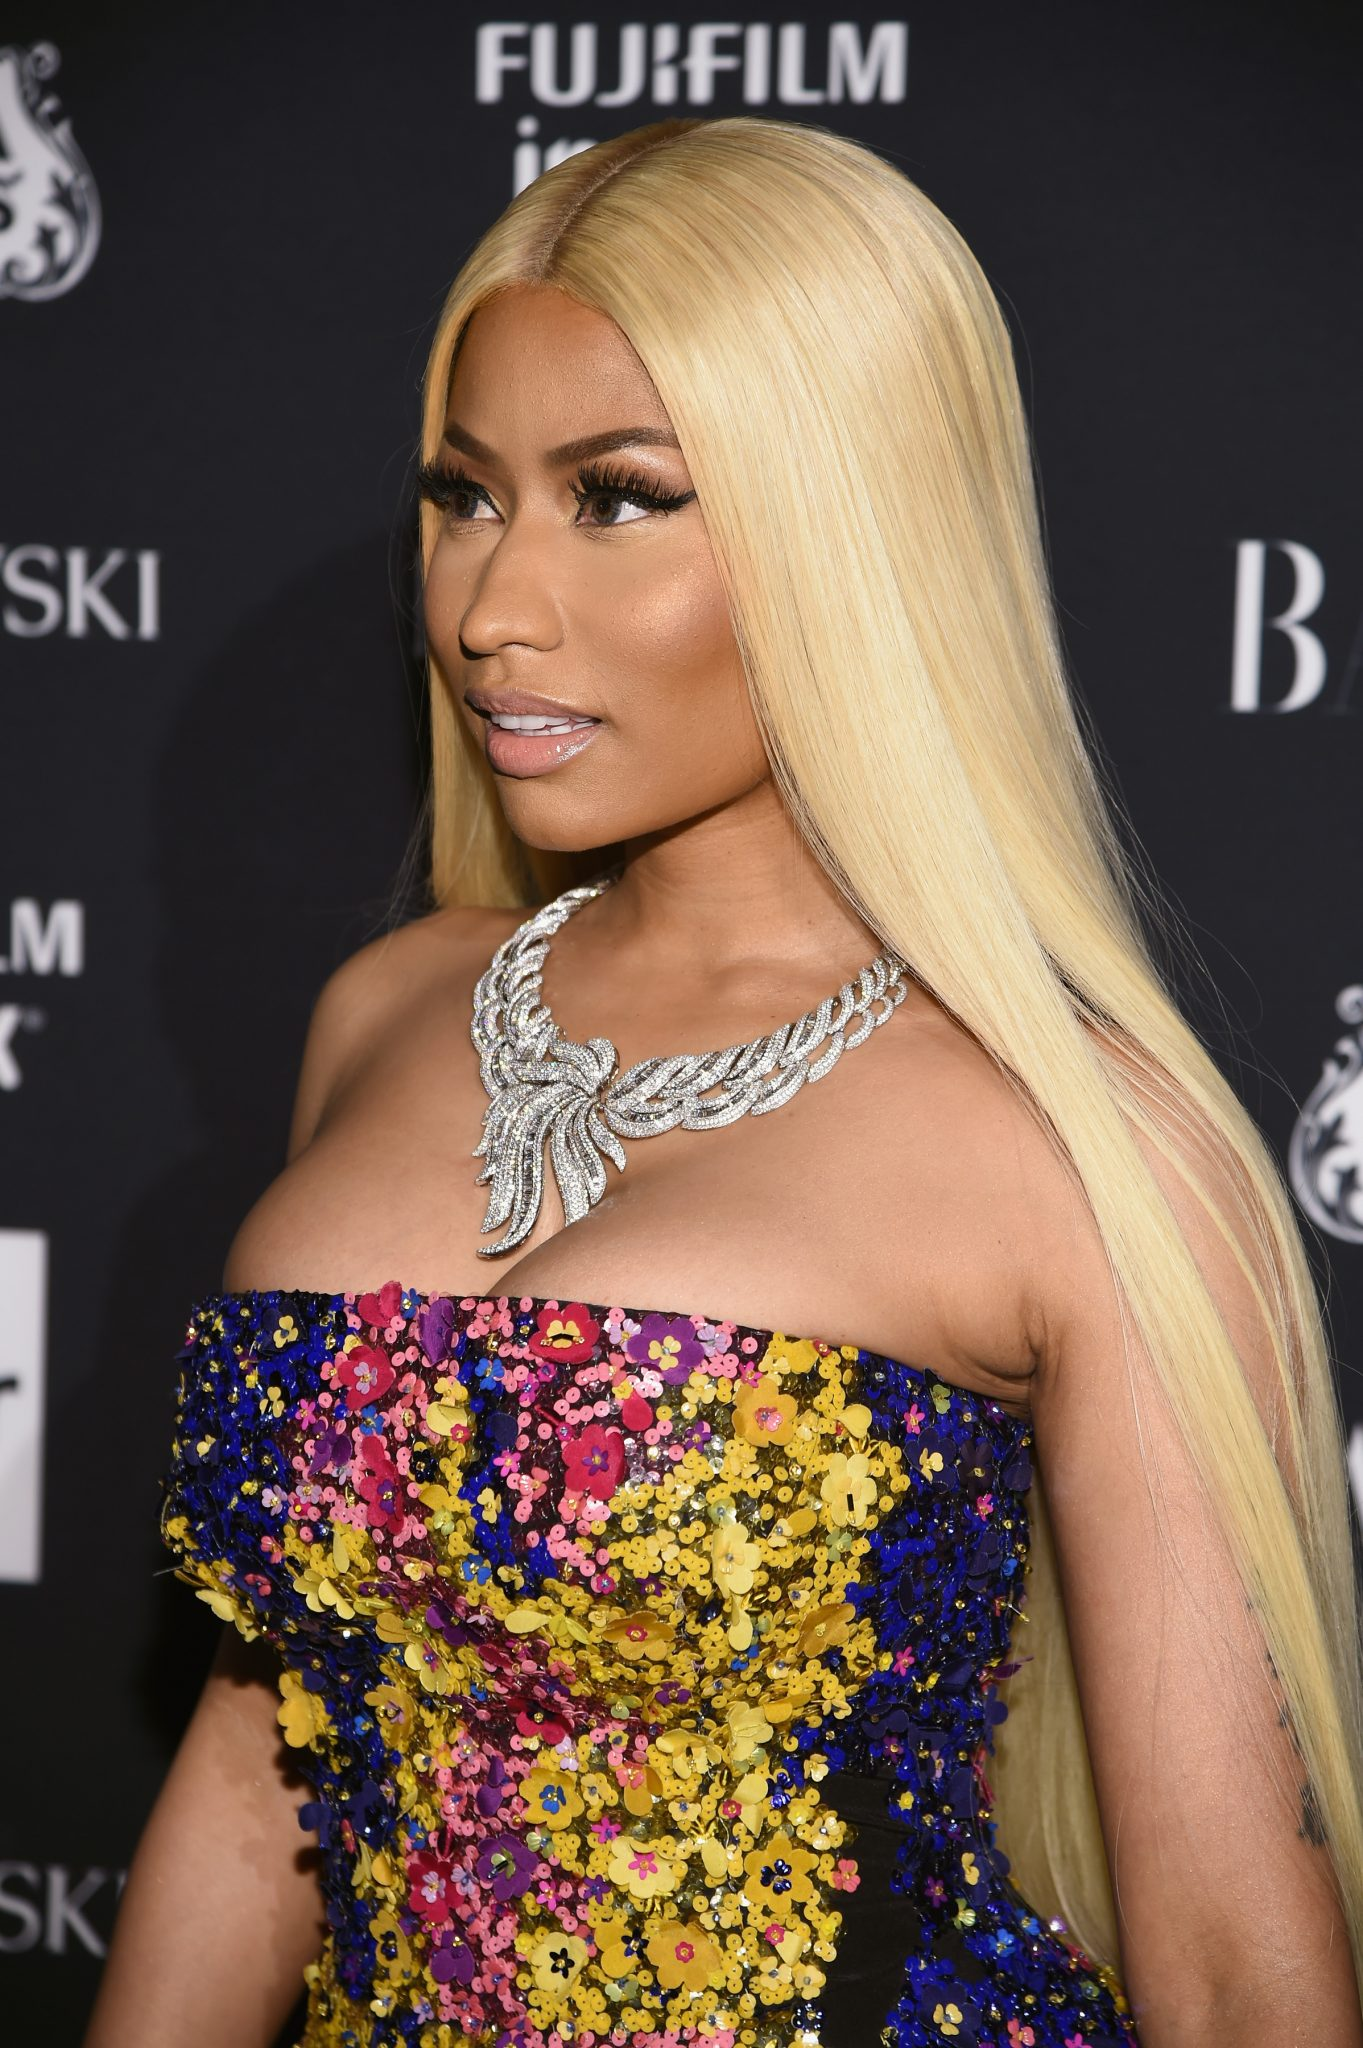 86bcbf641638 Rapper Nicki Minaj attended the Harper s BAZAAR Icon Celebration in New  York City yesterday evening and I must say